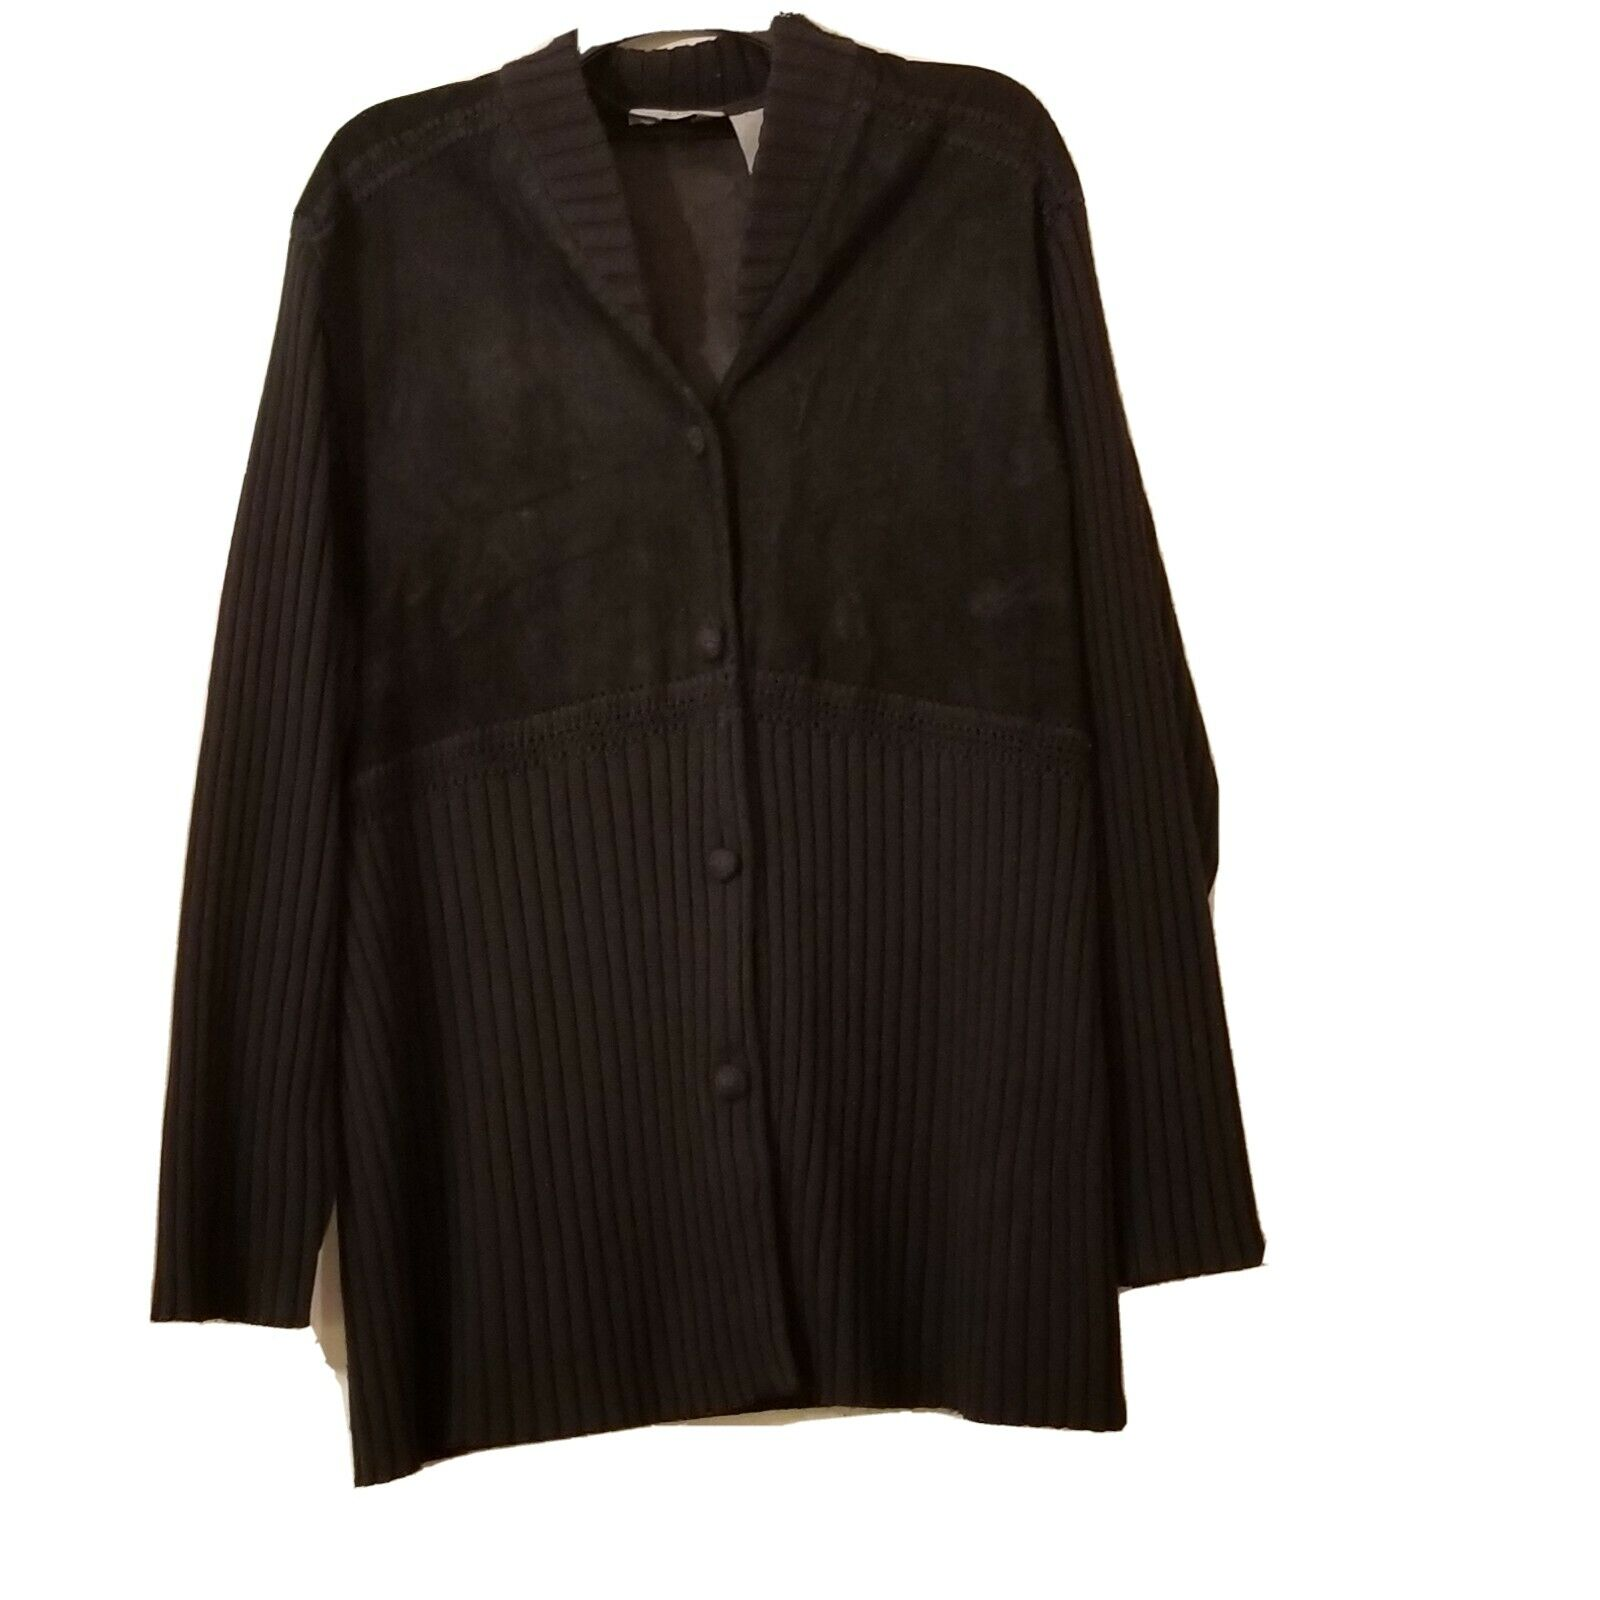 J Jill Cardigan  Wool/suede Leather Blend Woven L… - image 4